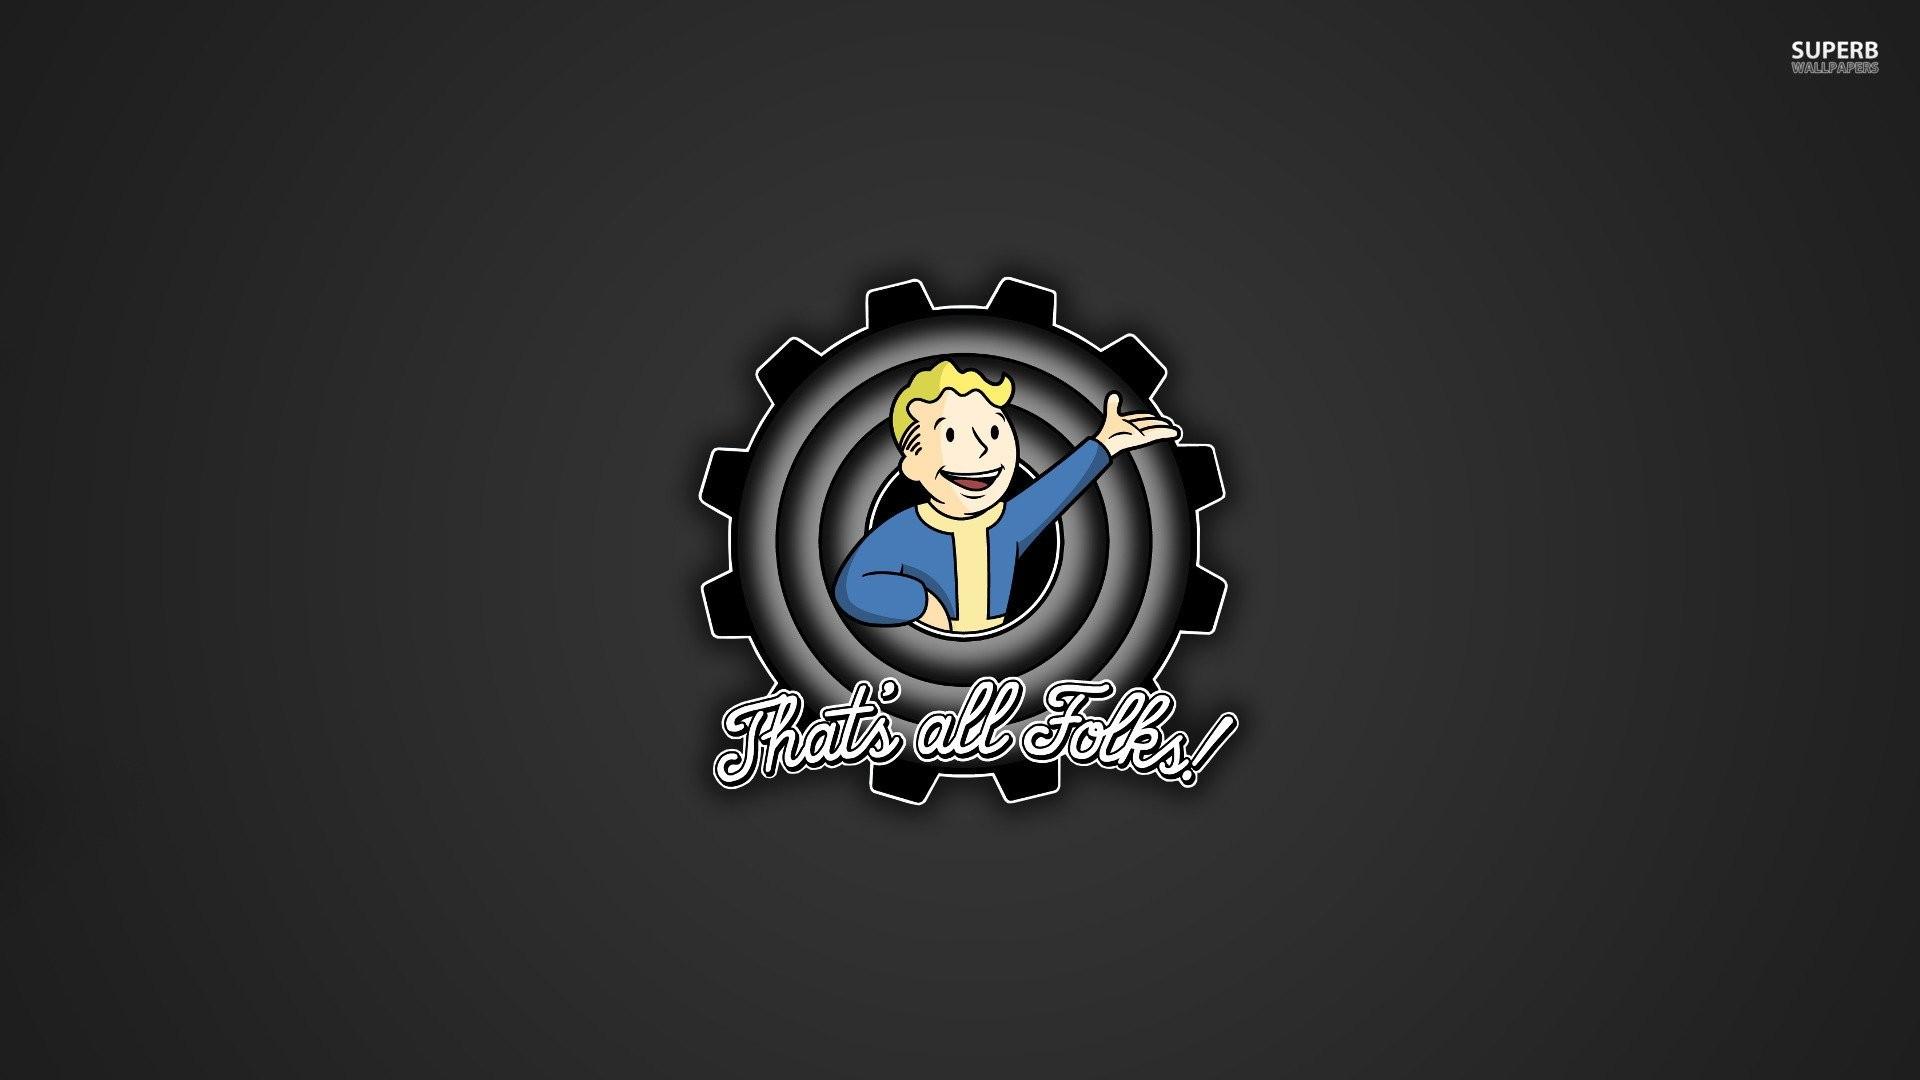 Fallout Vault Boy Wallpaper Download Free Amazing High